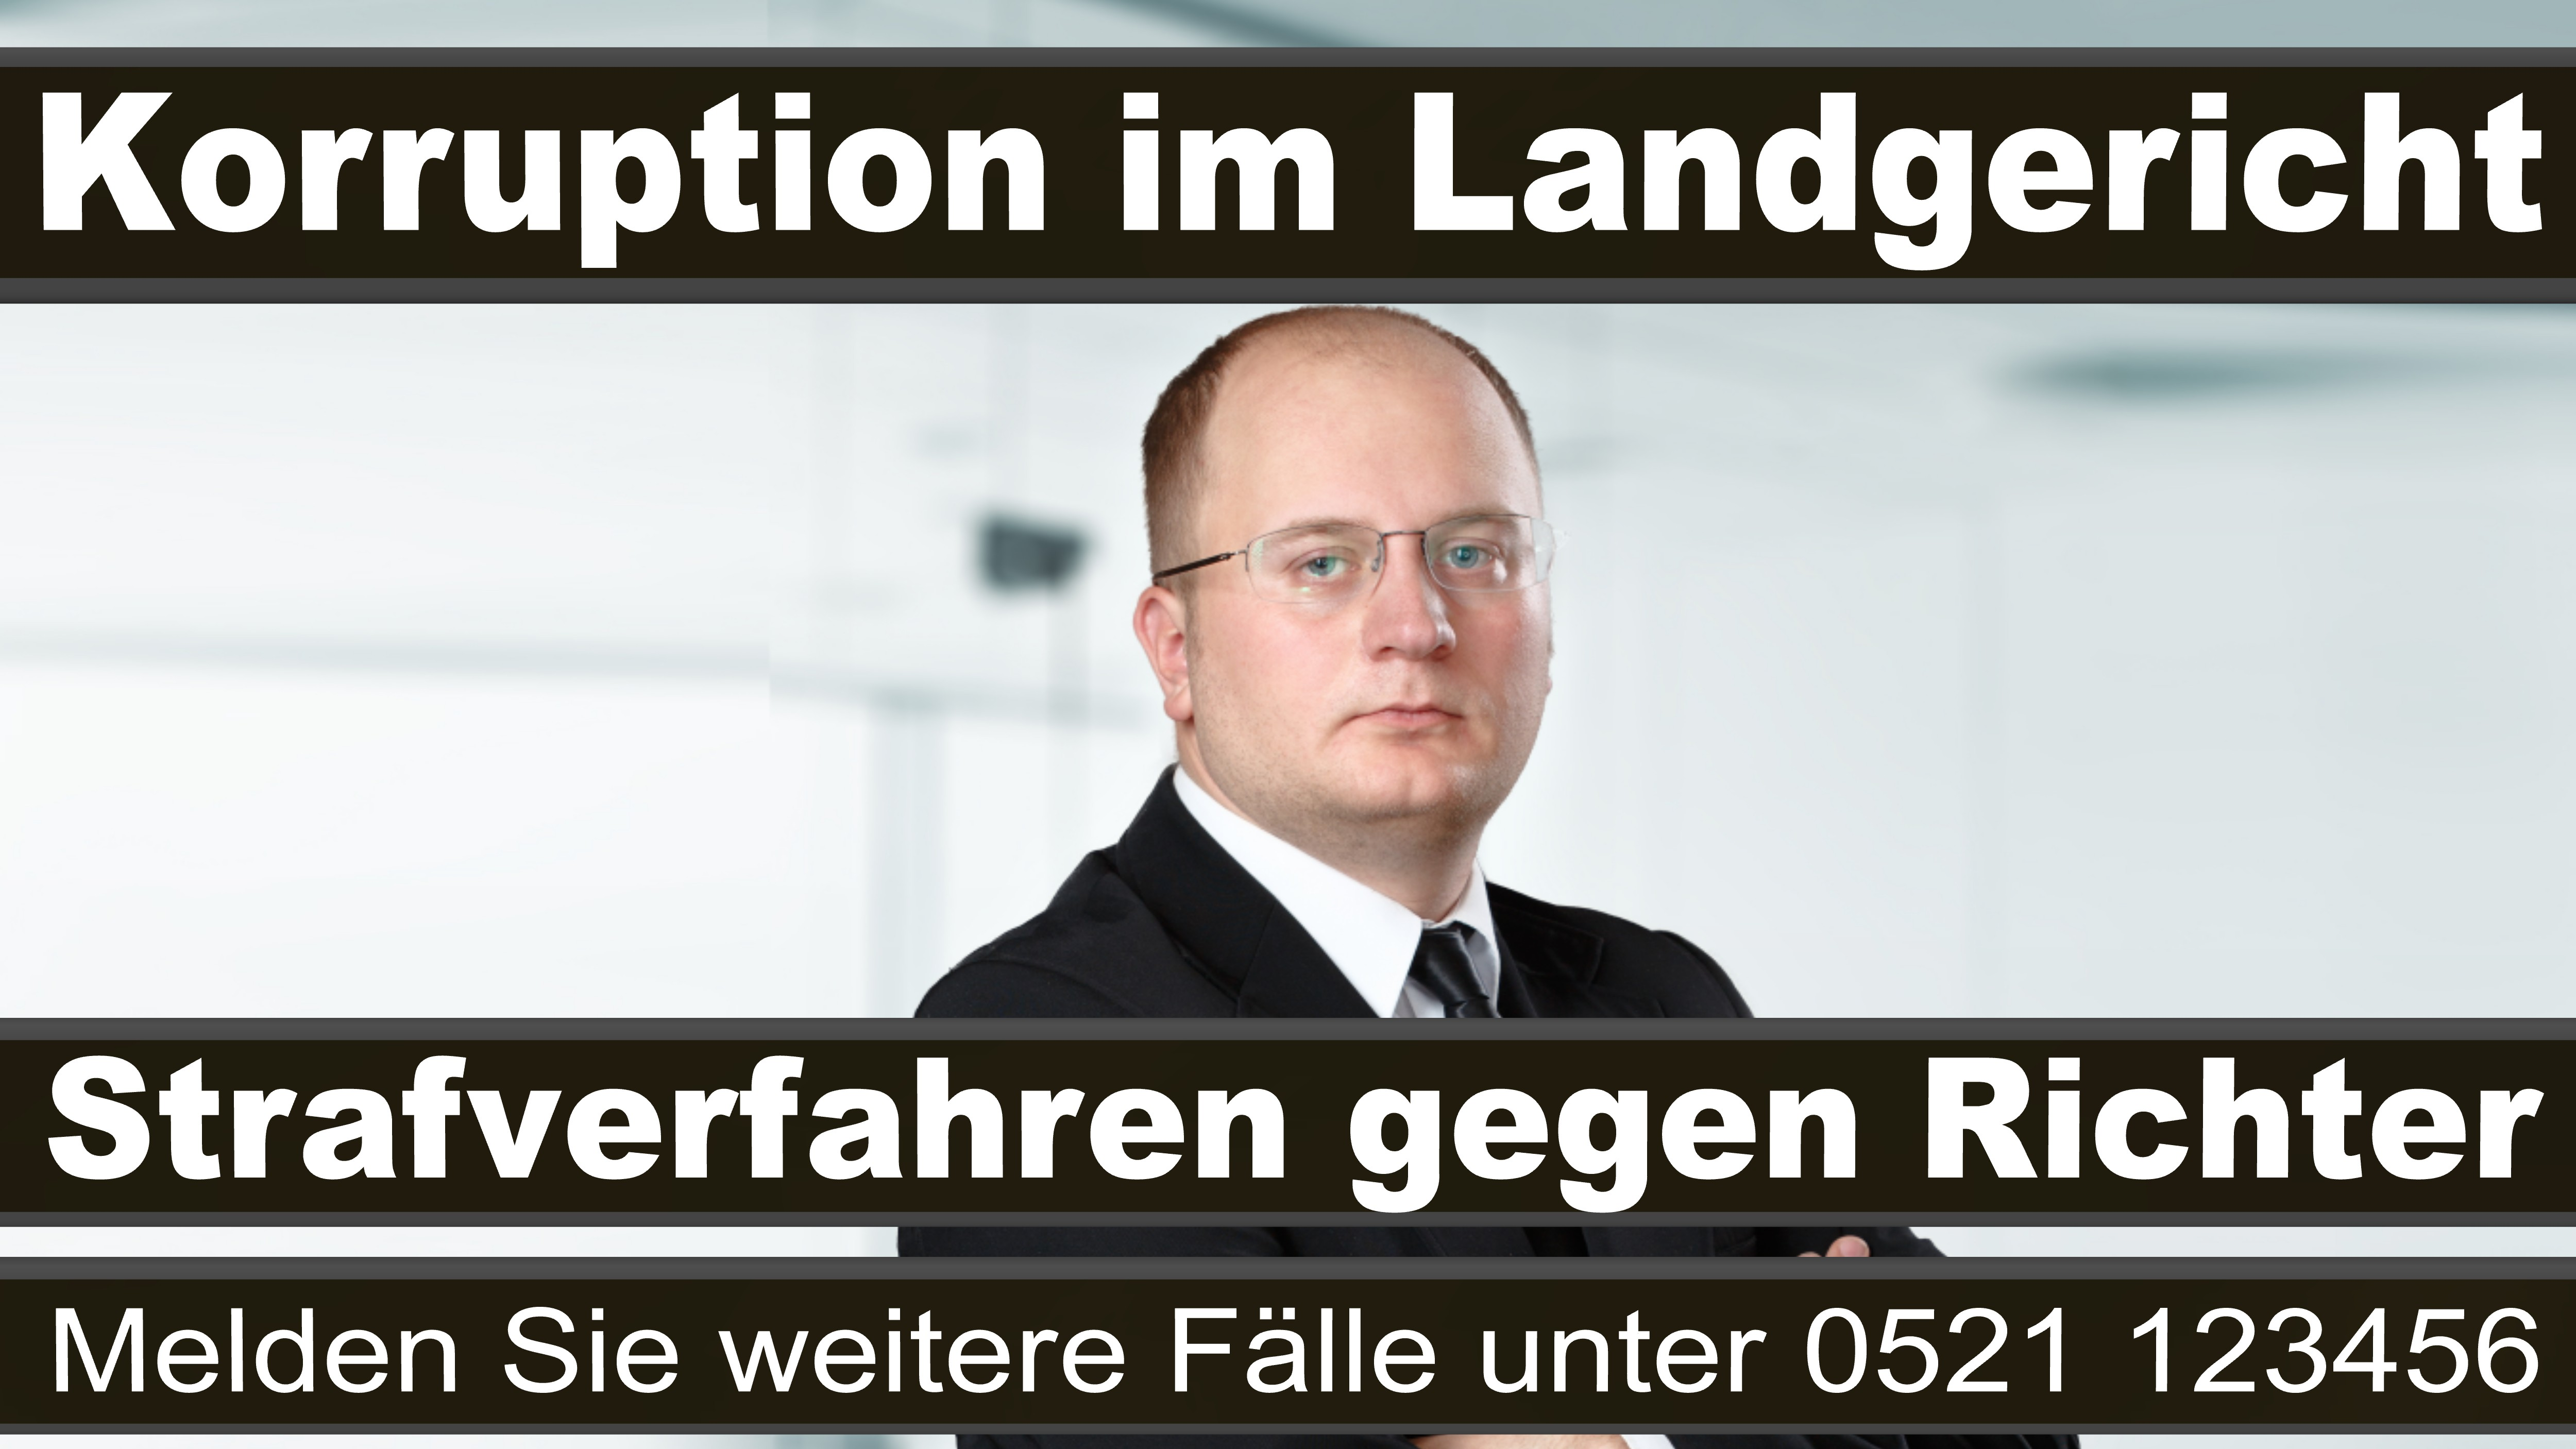 Generalstaatsanwaltschaft Brandenburg